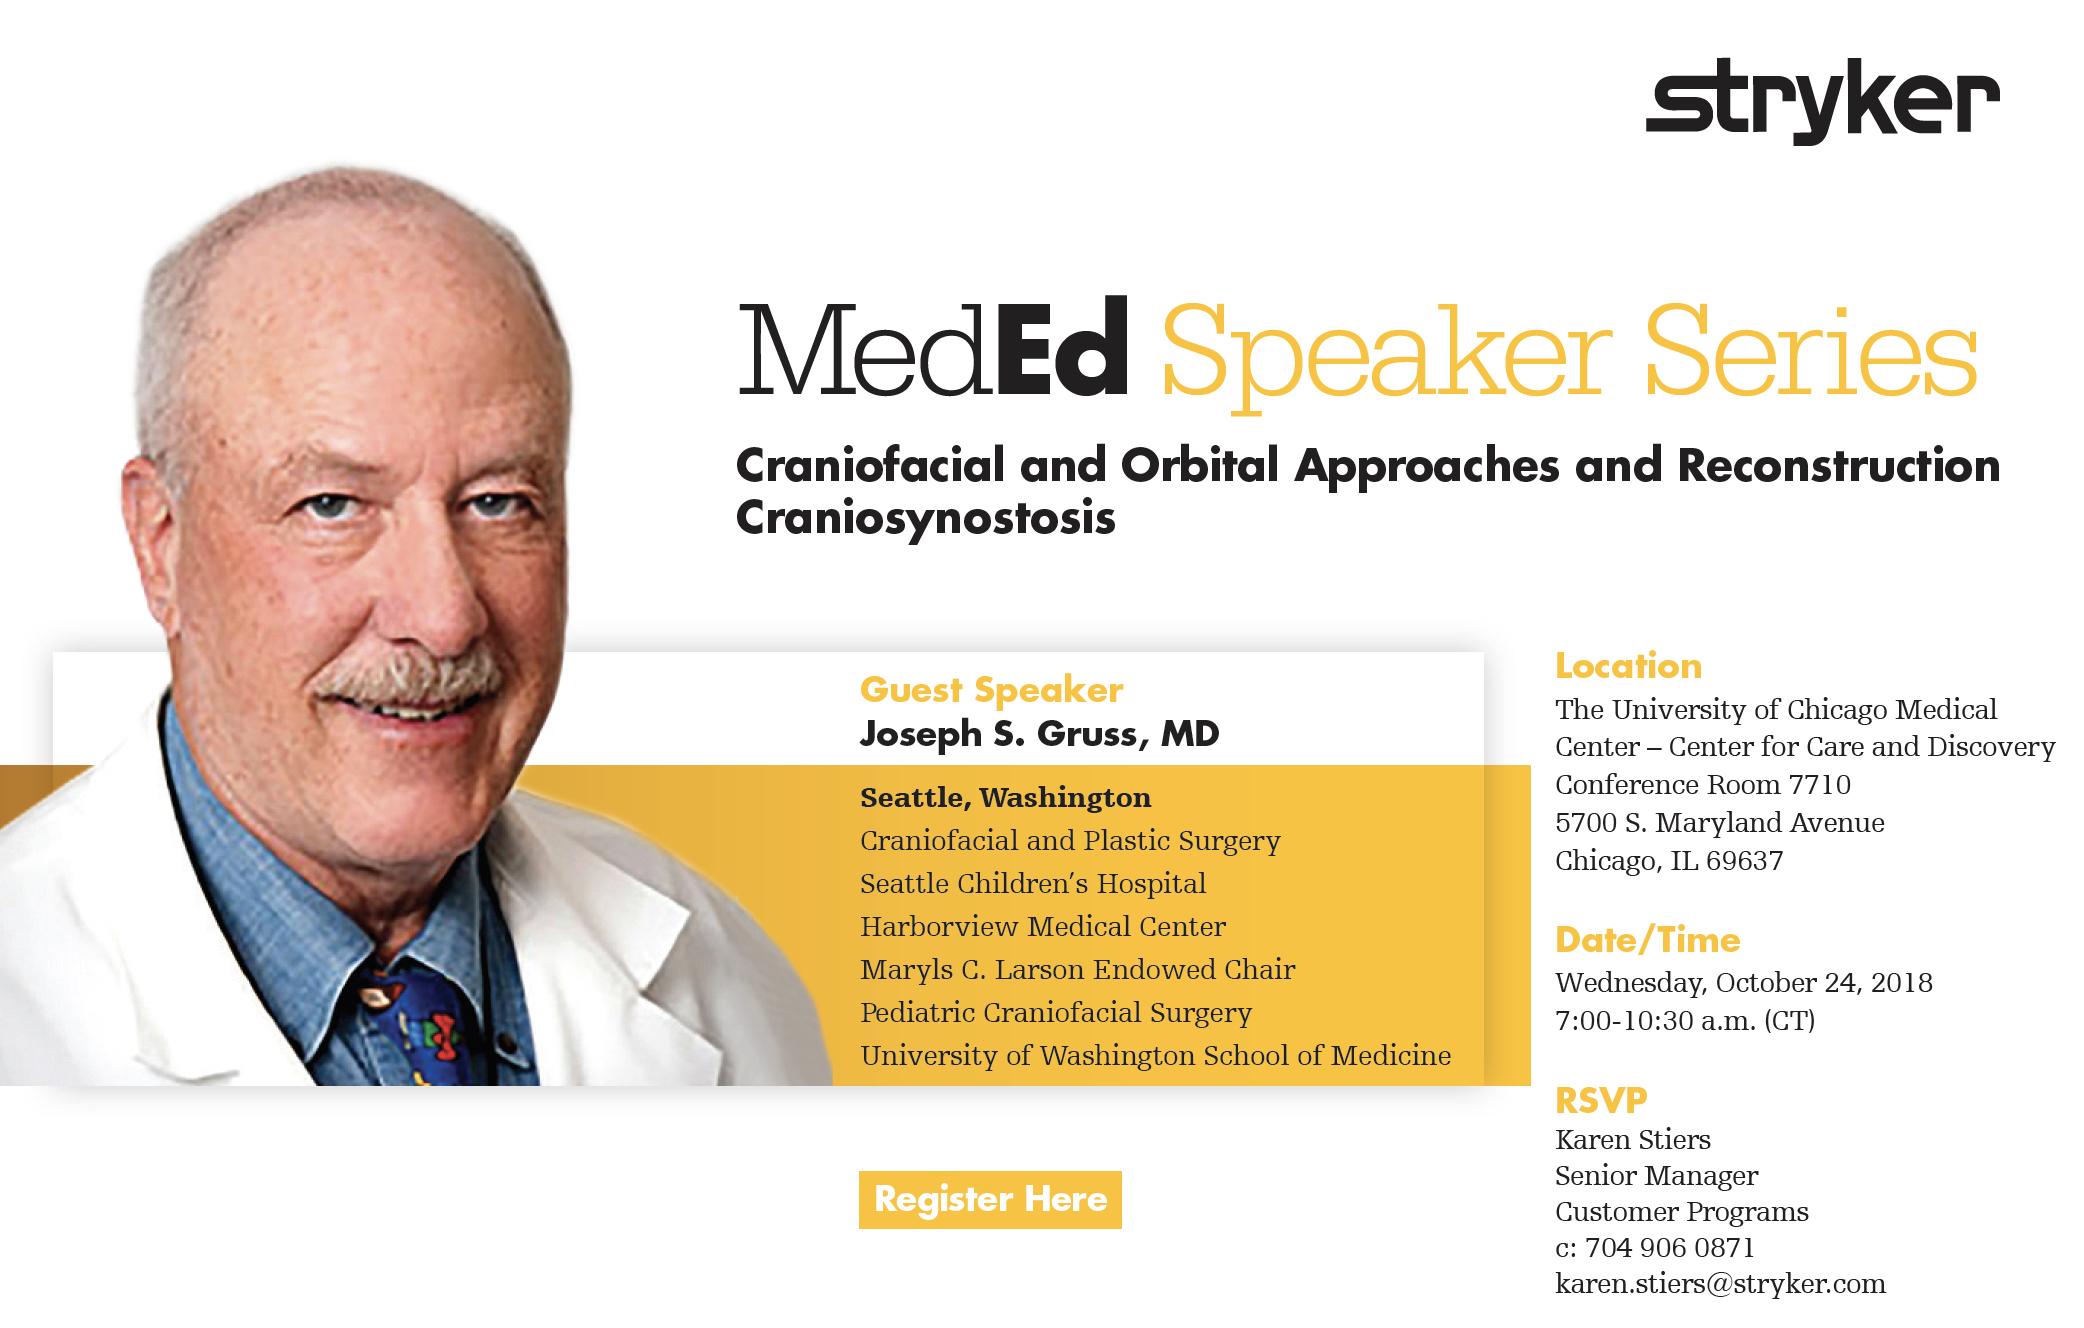 Stryker's Speaker Series: Craniofacial and Orbital